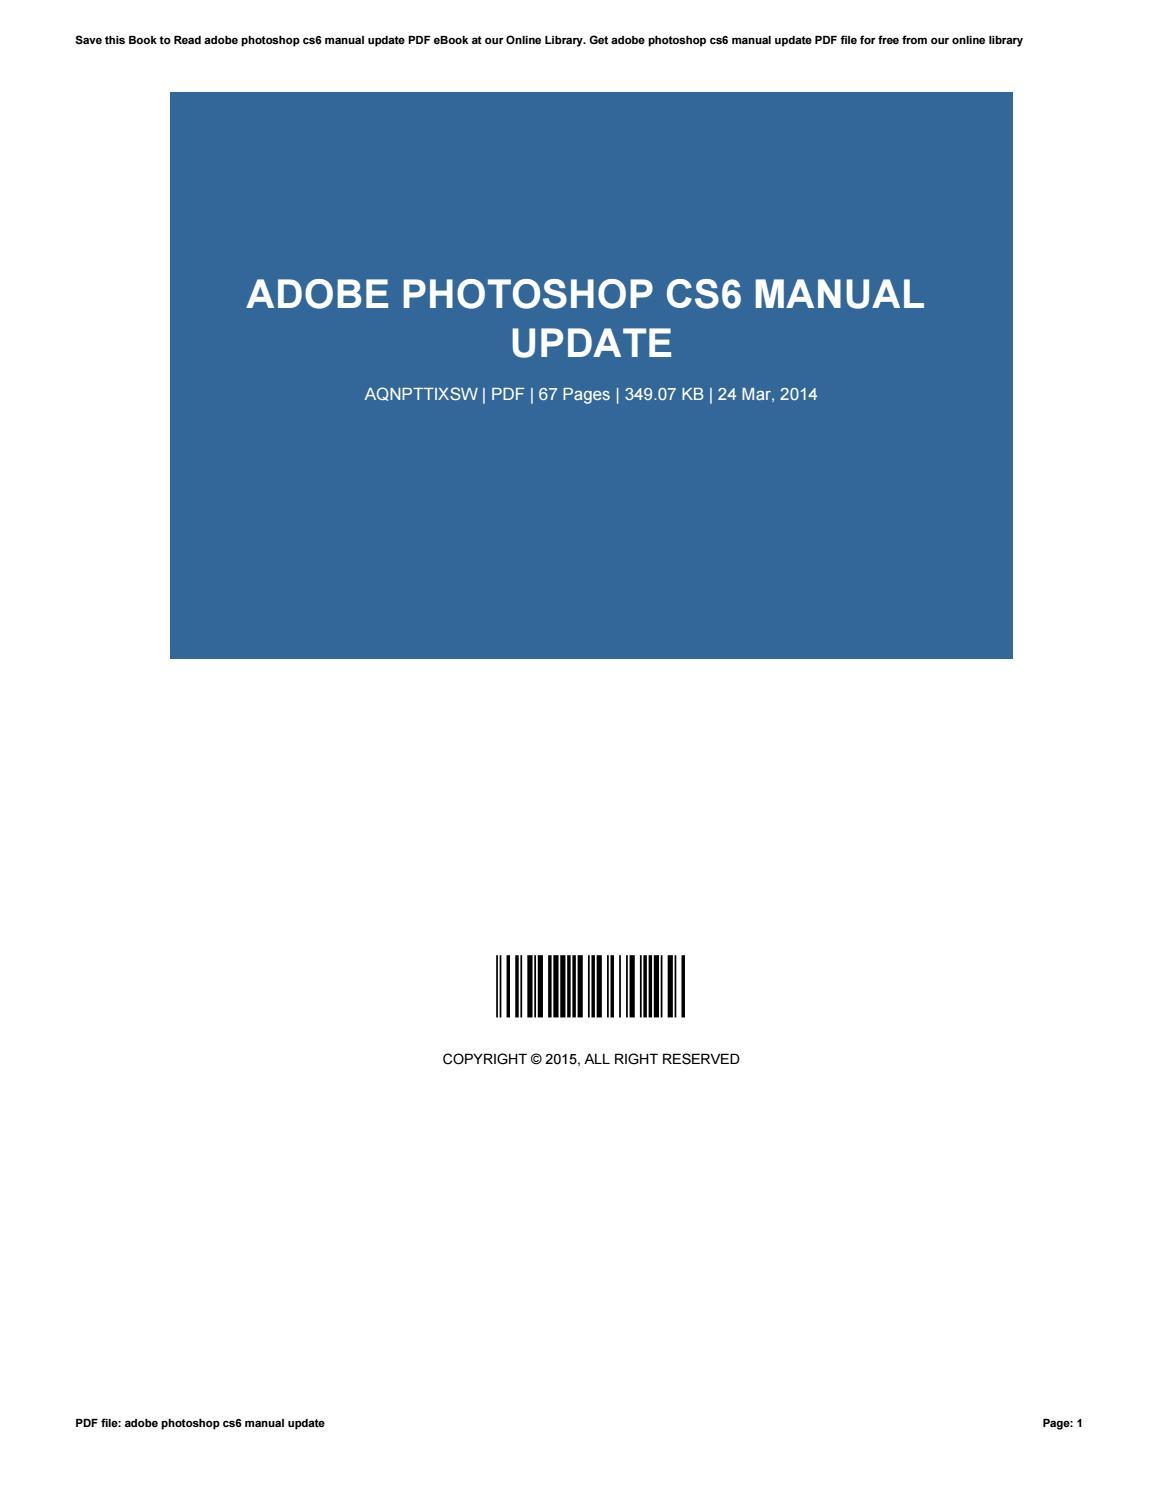 Adobe Photoshop Cs6 Manuals Update